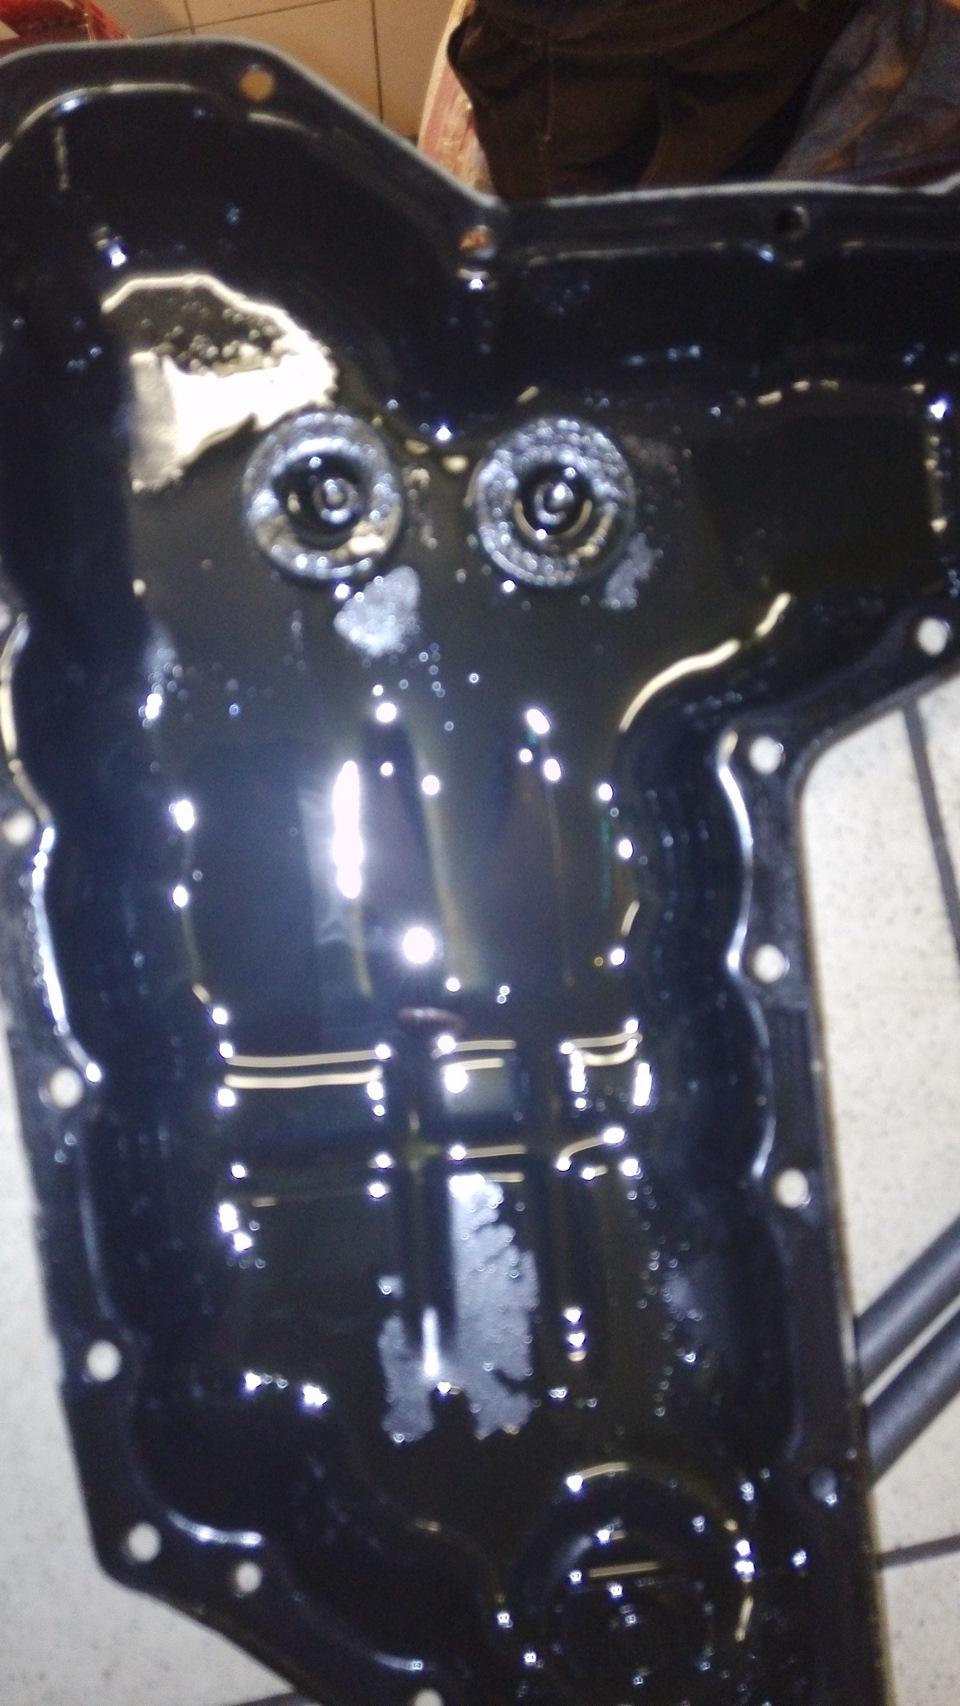 Ремонт вариатора ниссан мурано z50 своими руками